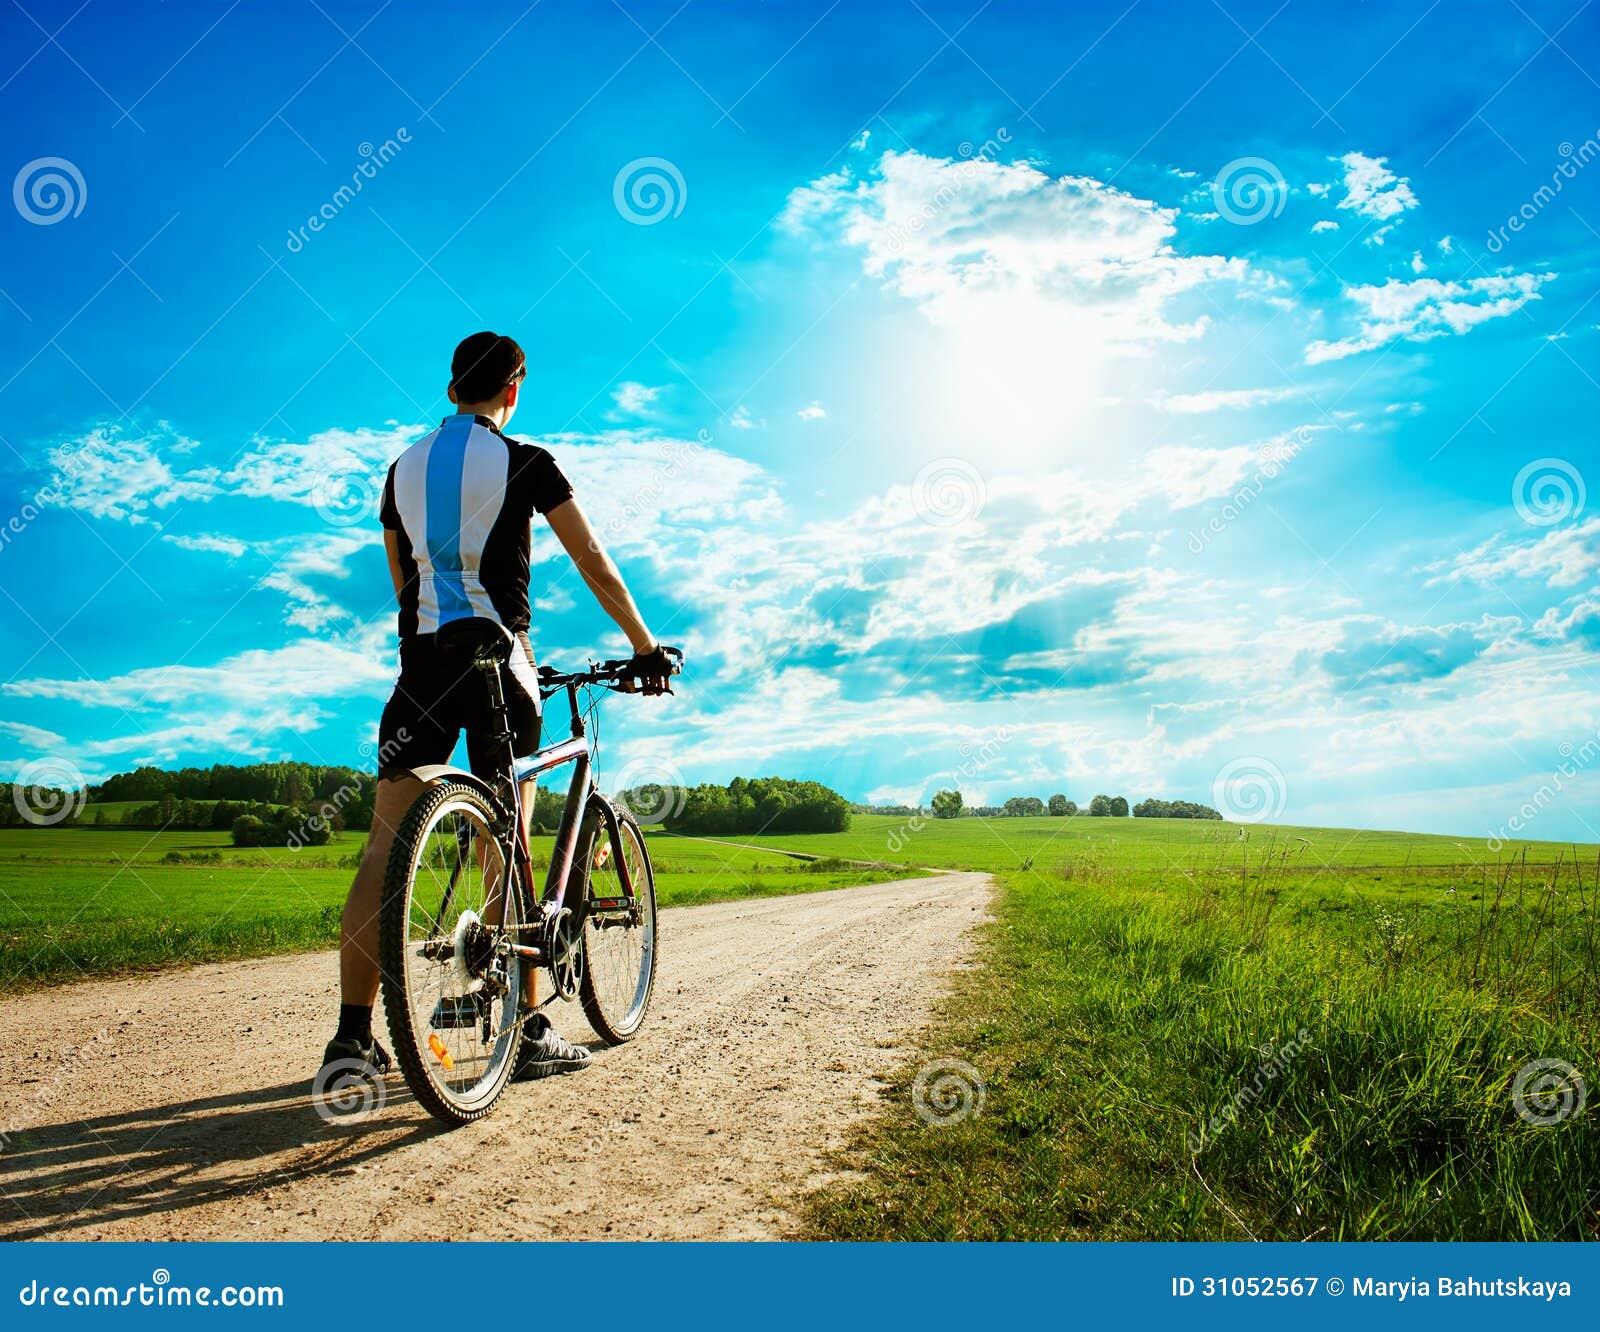 bike wheel clipart